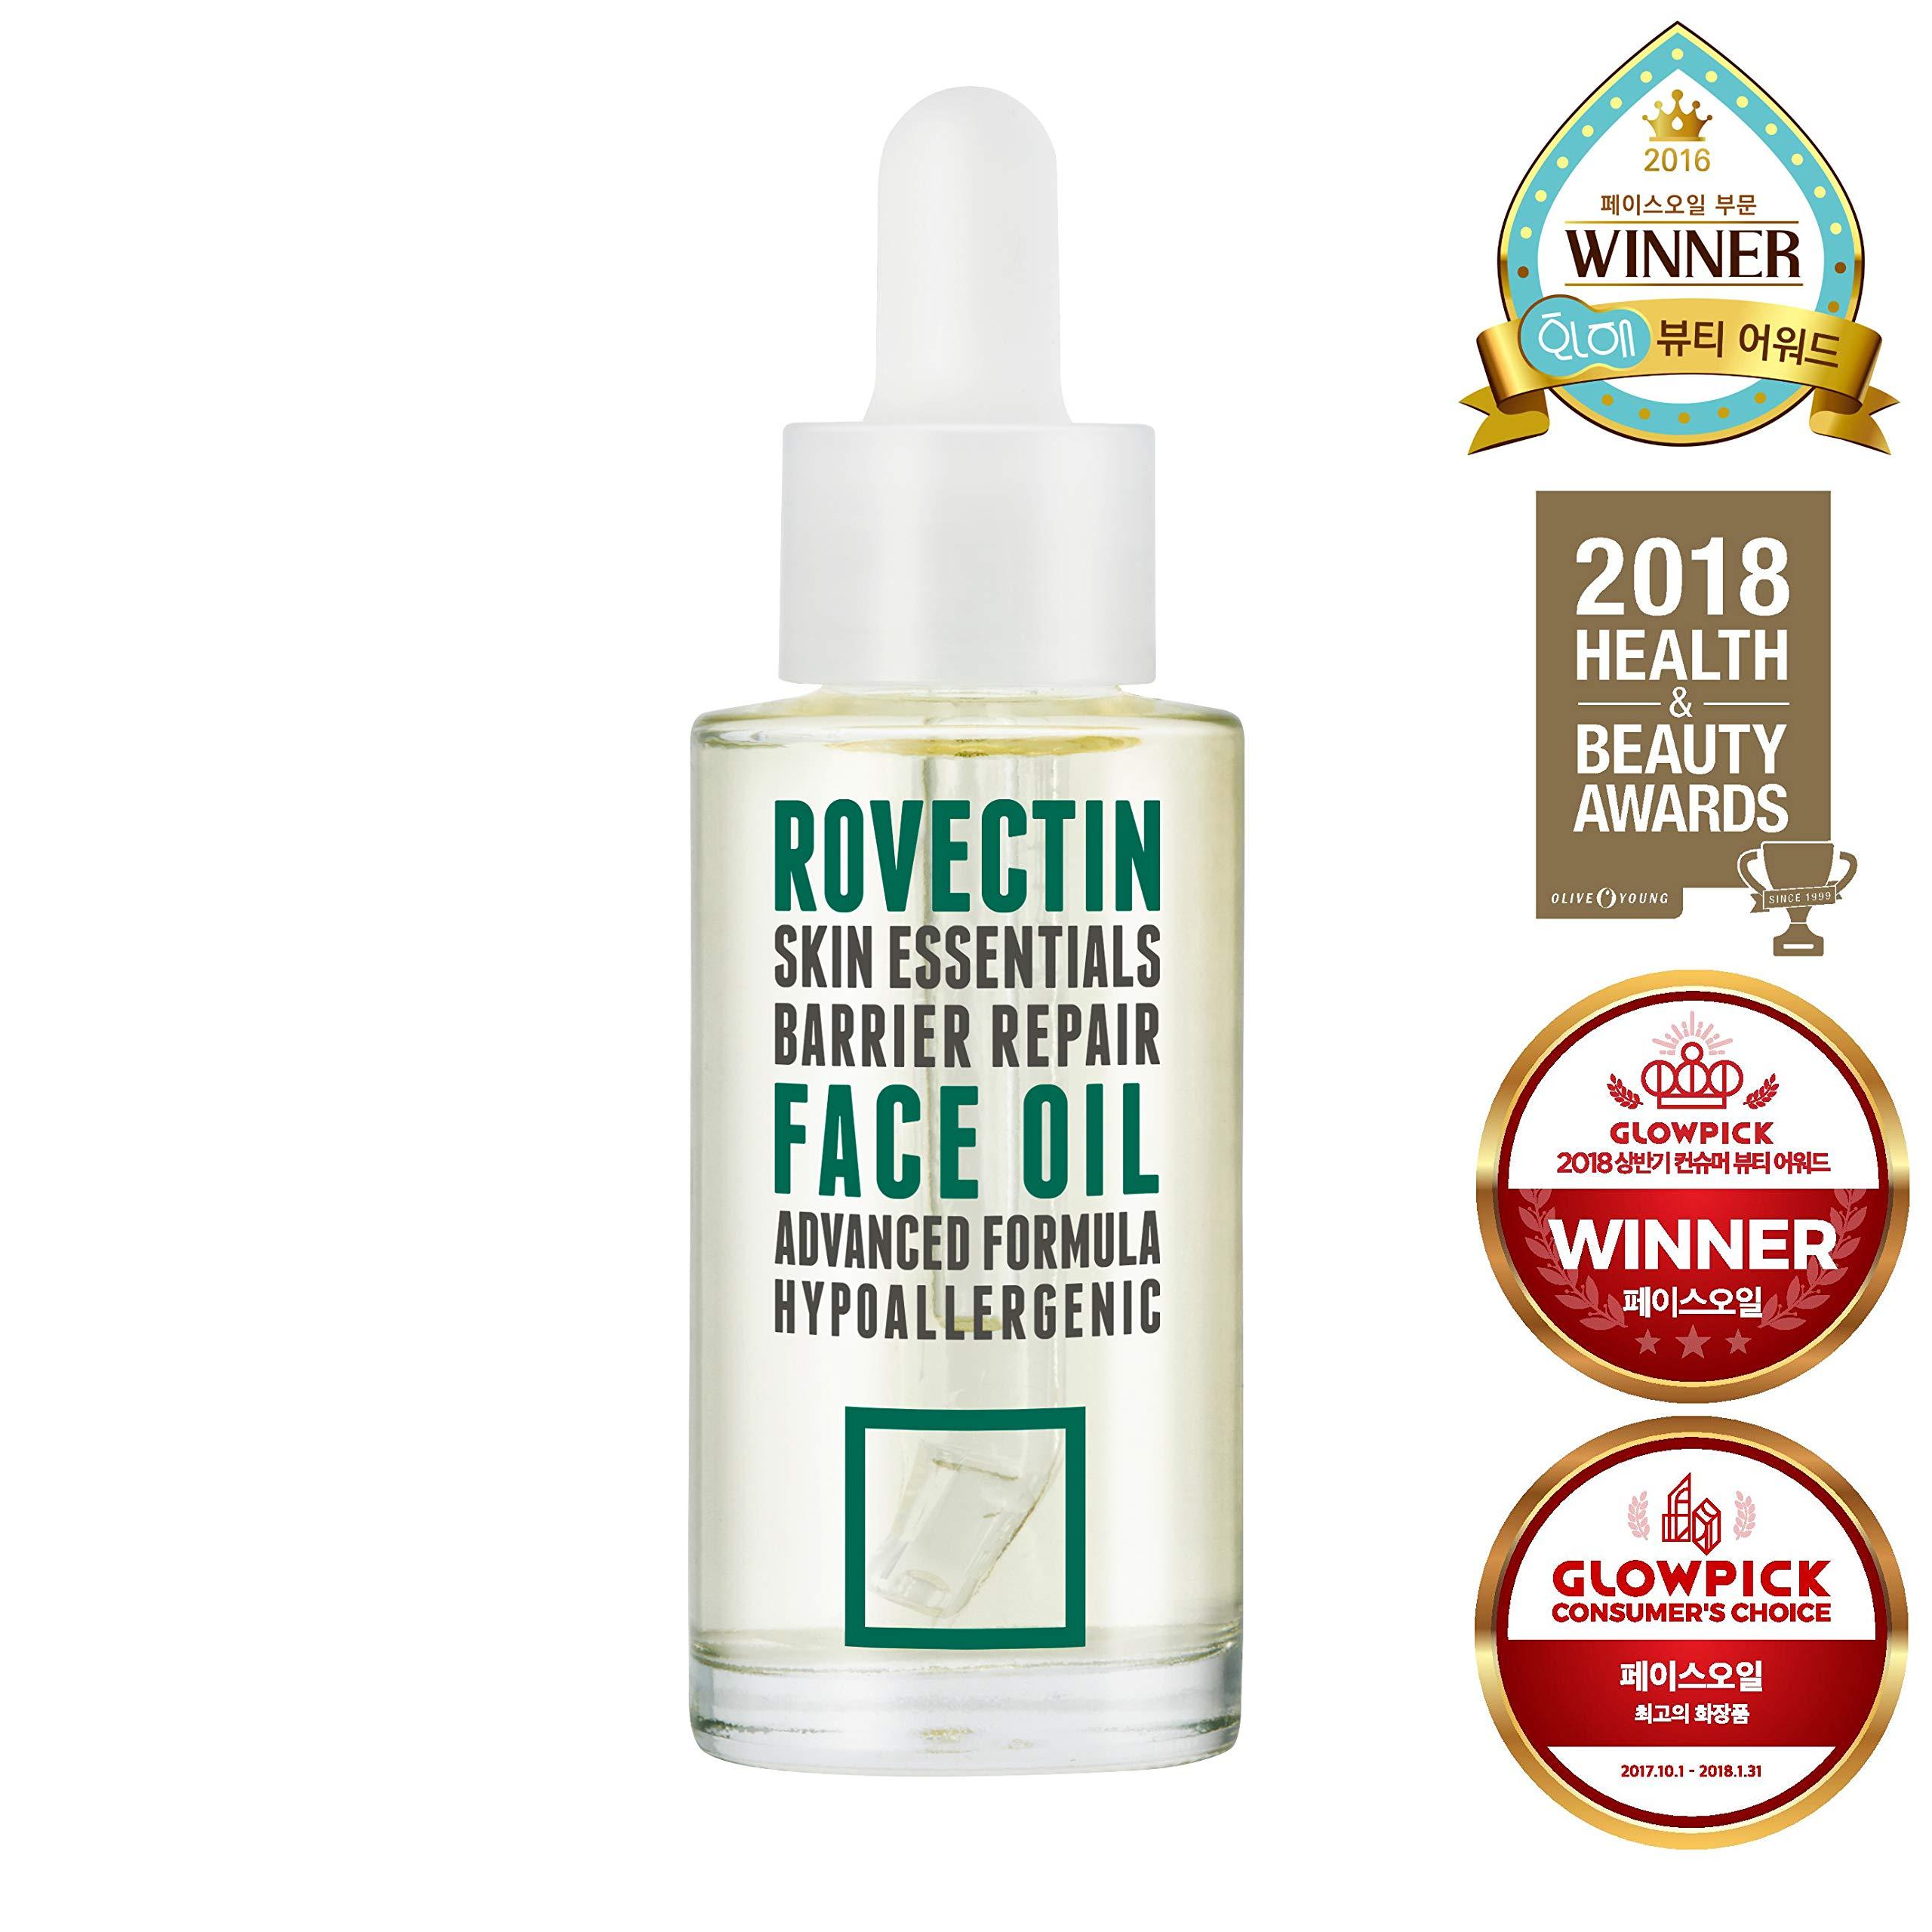 Rovectin Barrier Repair Face Oil 1 fl oz-Anti-Aging Facial Oil and Moisturizer with Neroli Oil and Antioxidant Vitamin E